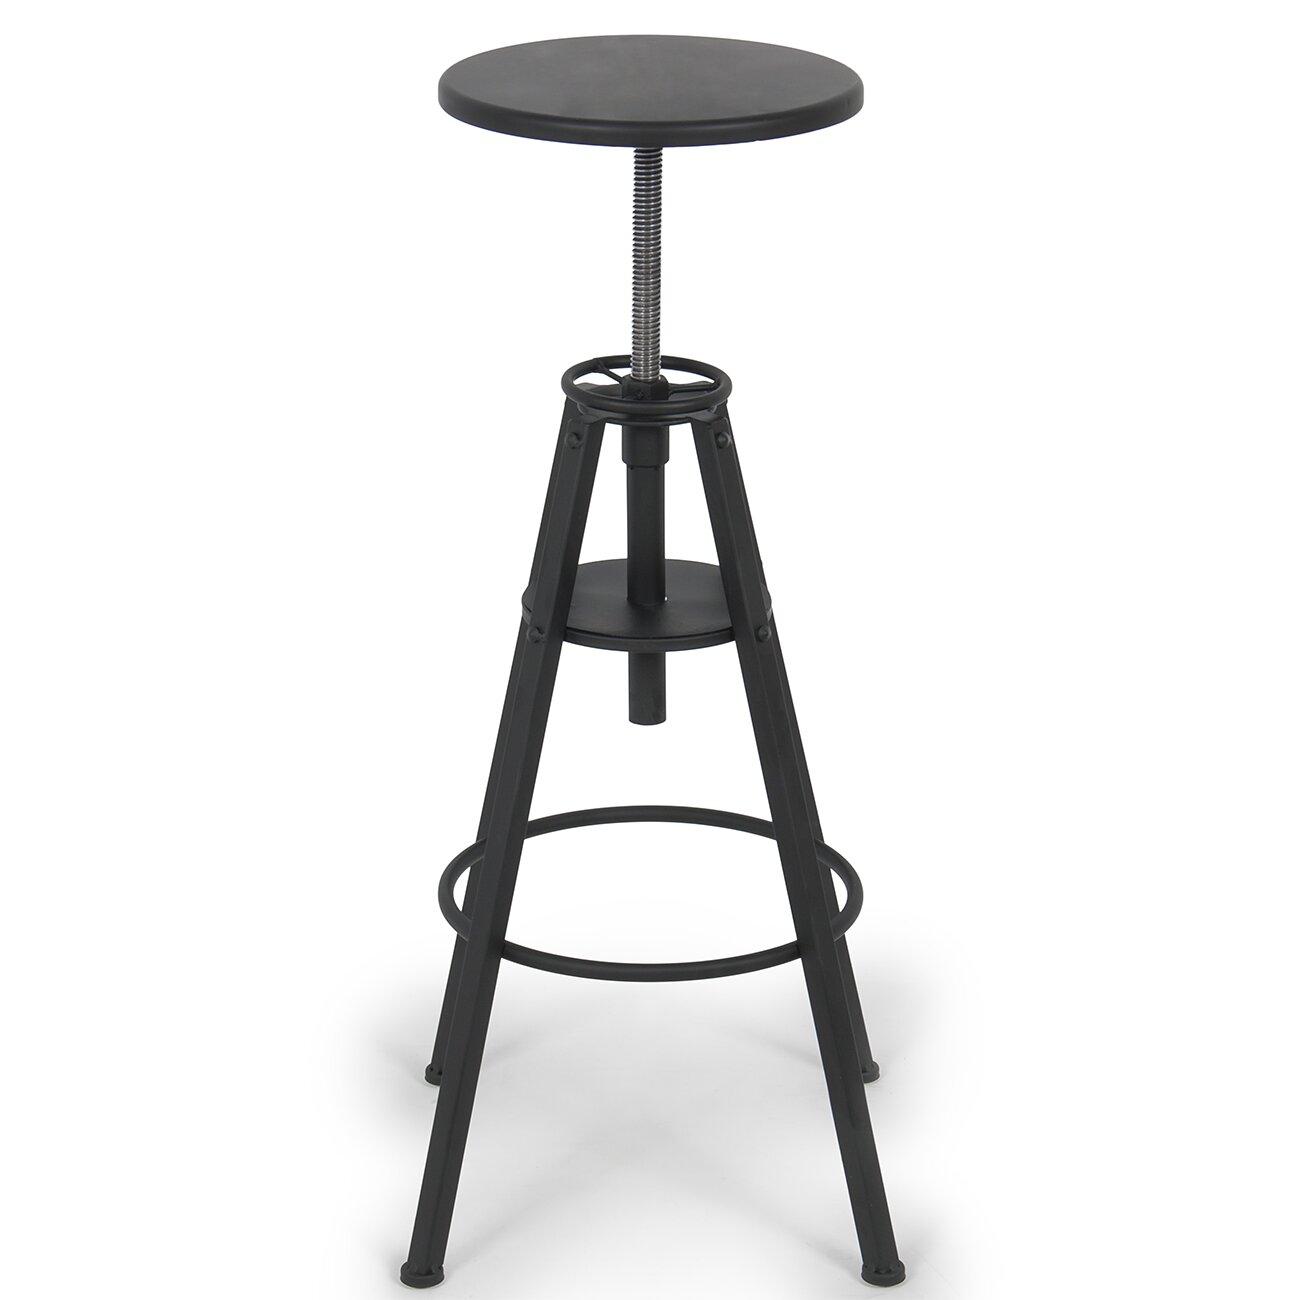 Belleze adjustable height swivel bar stool reviews wayfair for Adjustable height bar stools